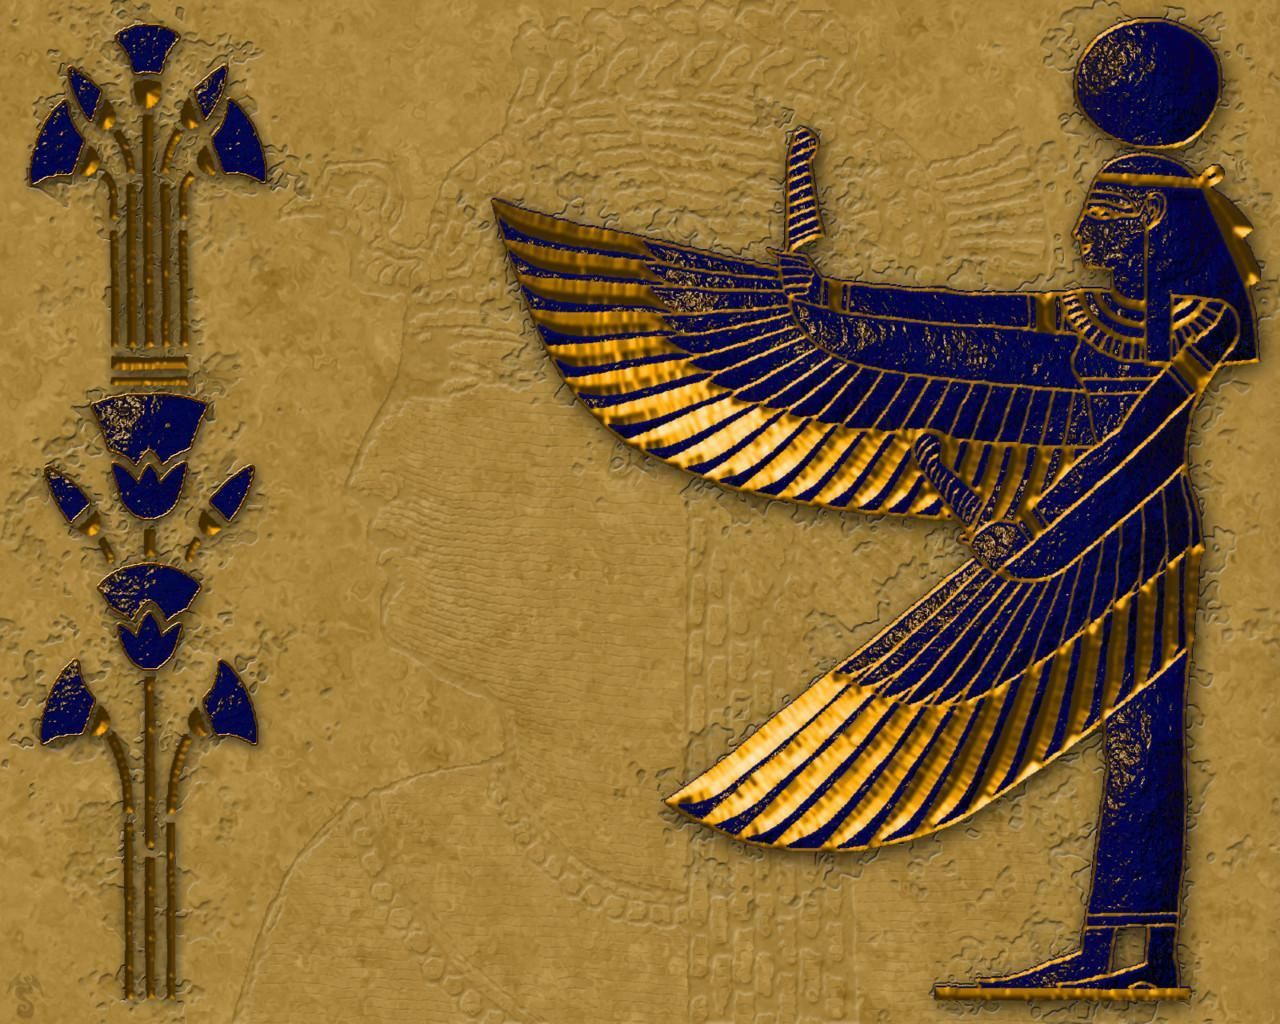 Egyptian Desktop And Mobile Wallpaper Wallippo Wallpaper Egyptian Ancient